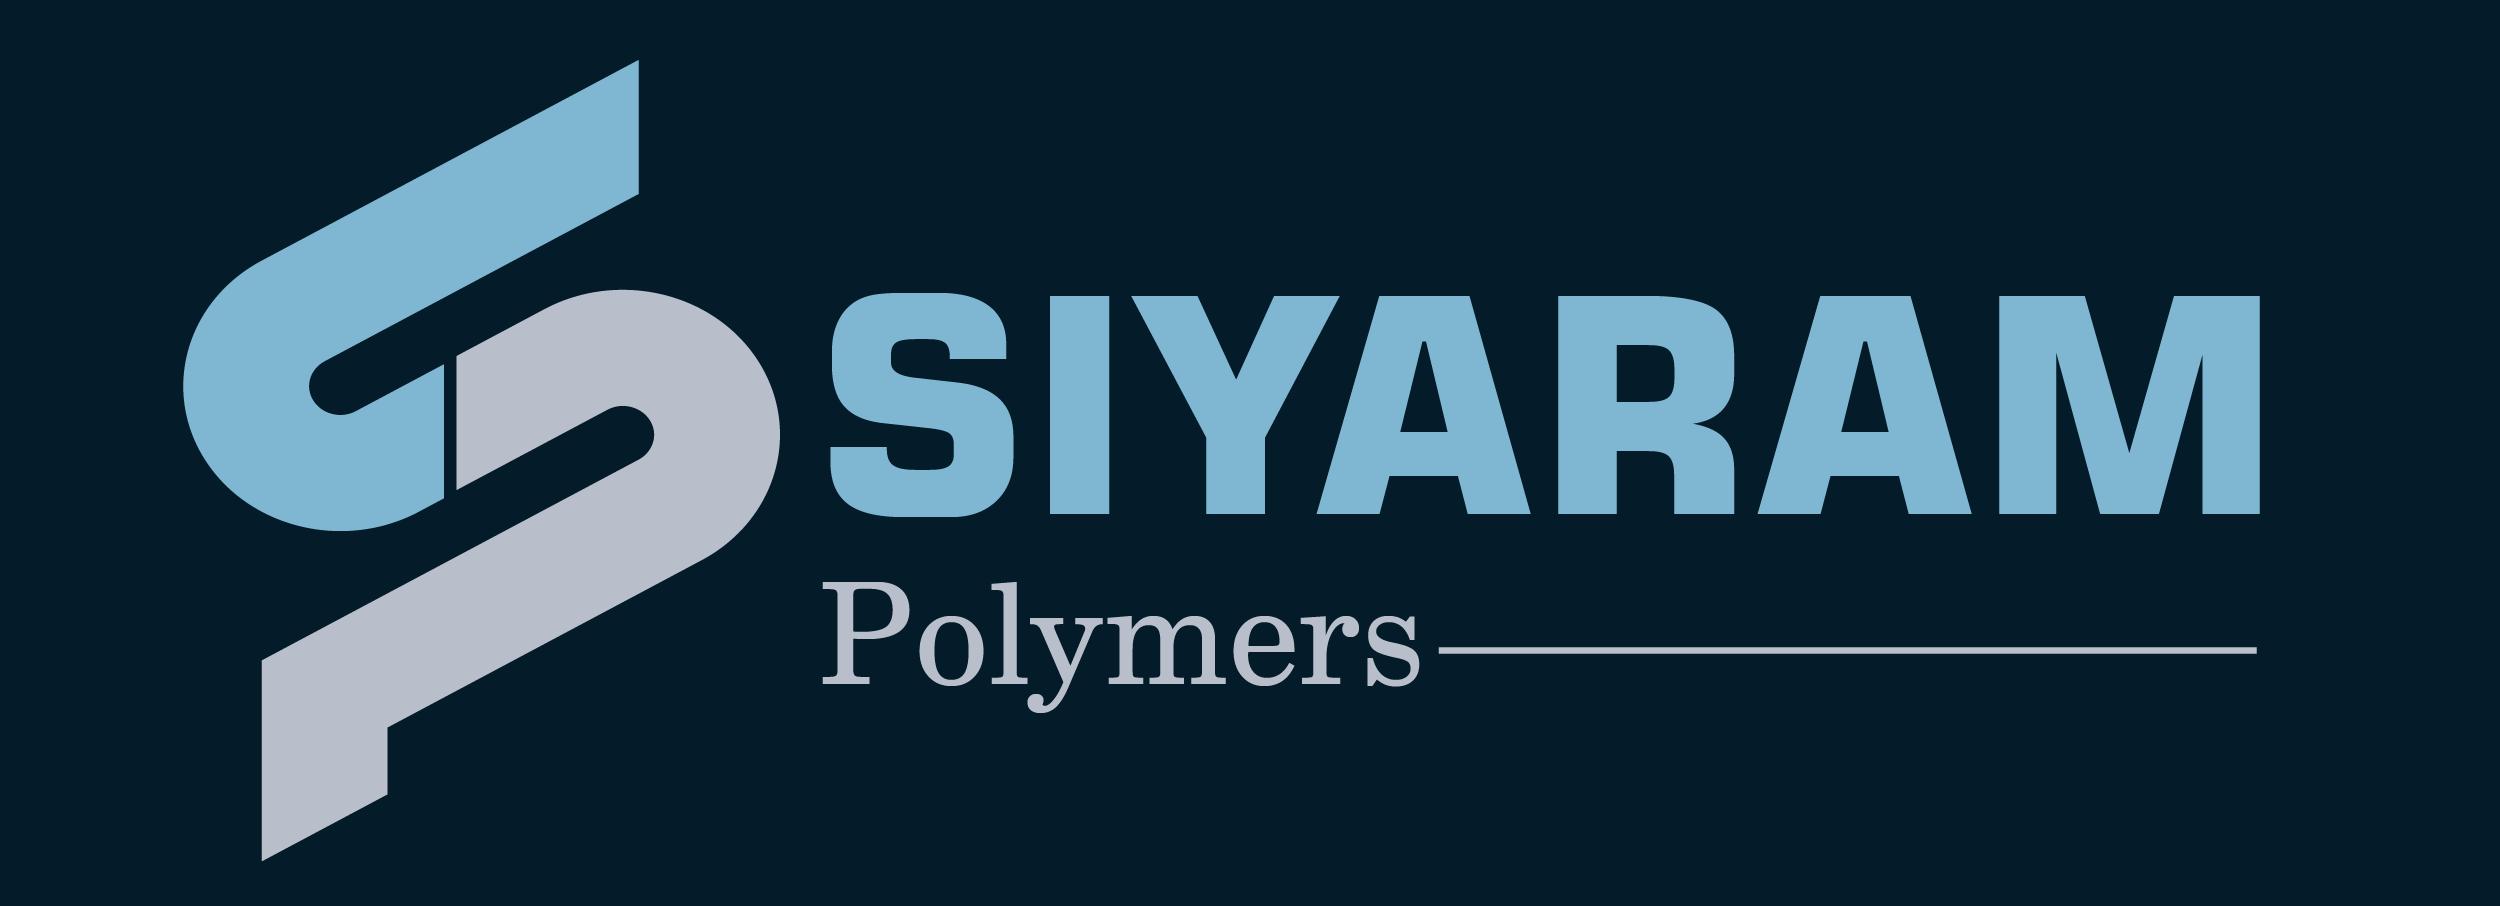 SiyaramPolymers